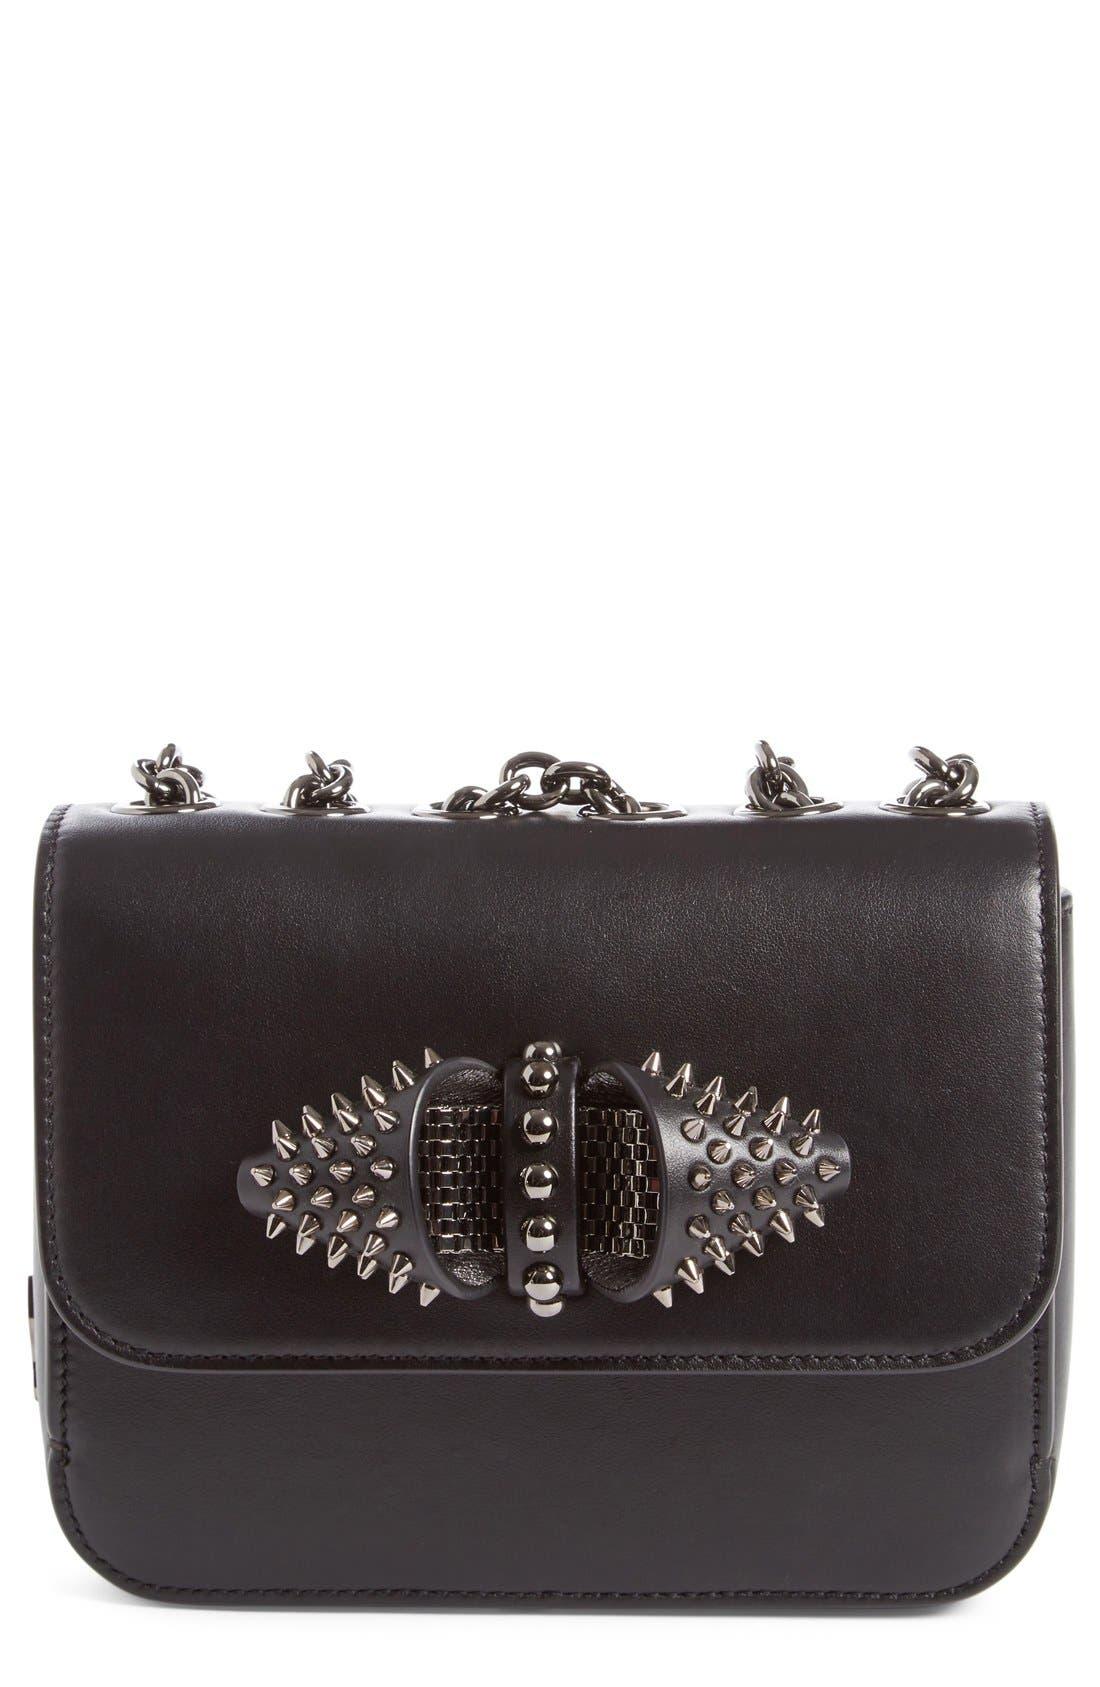 Main Image - Christian Louboutin 'Small Sweet Charity' Spiked Calfskin Shoulder/Crossbody Bag